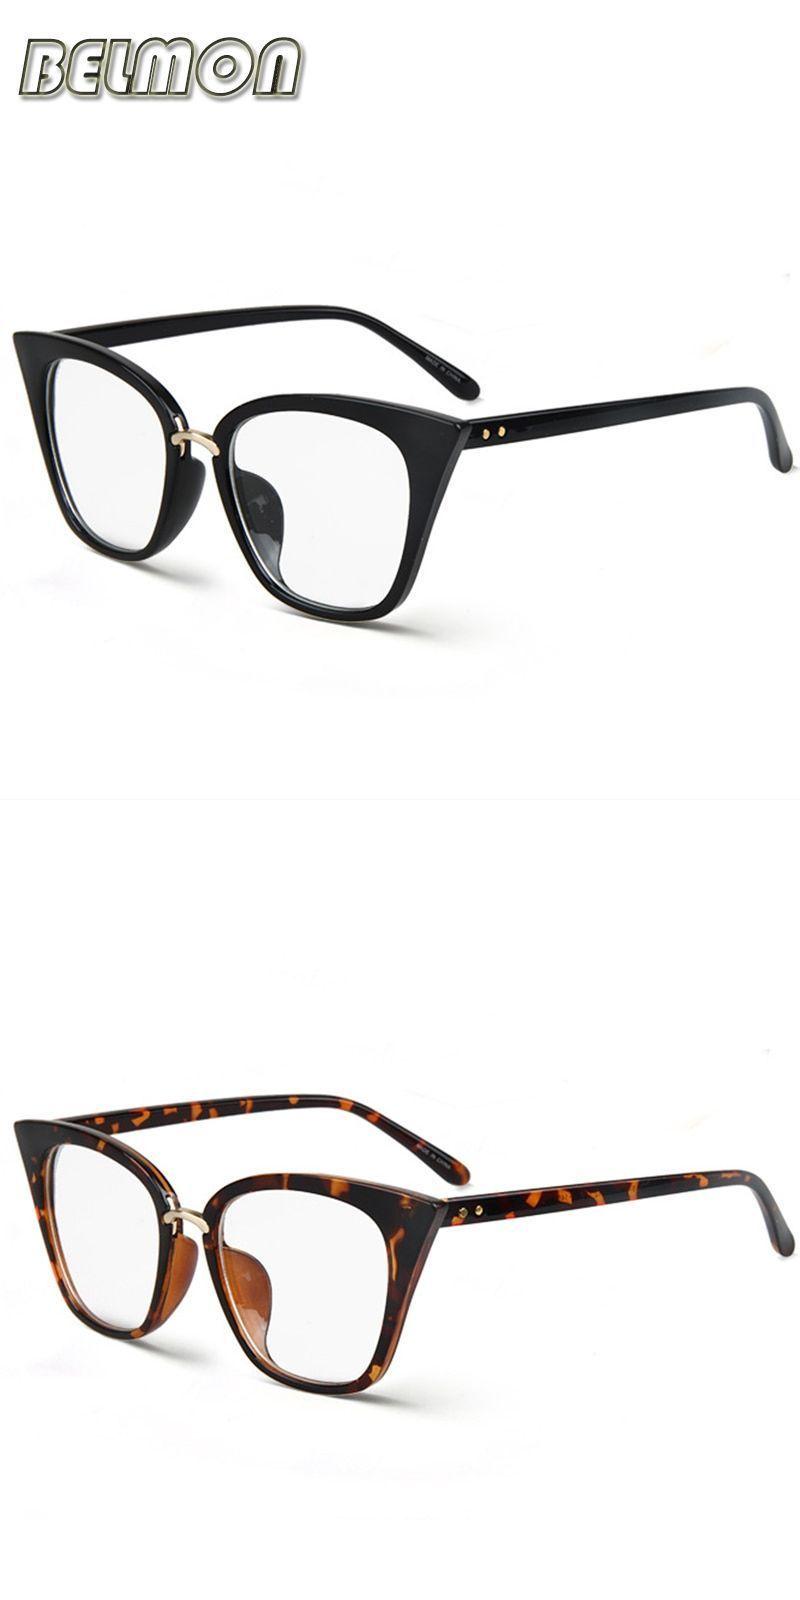 344144bff3d Eyeglasses frame women computer optical vintage eye glasses for women s  spectacle transparent clear lens armacao de rs266  frames  eyewear   accessories ...